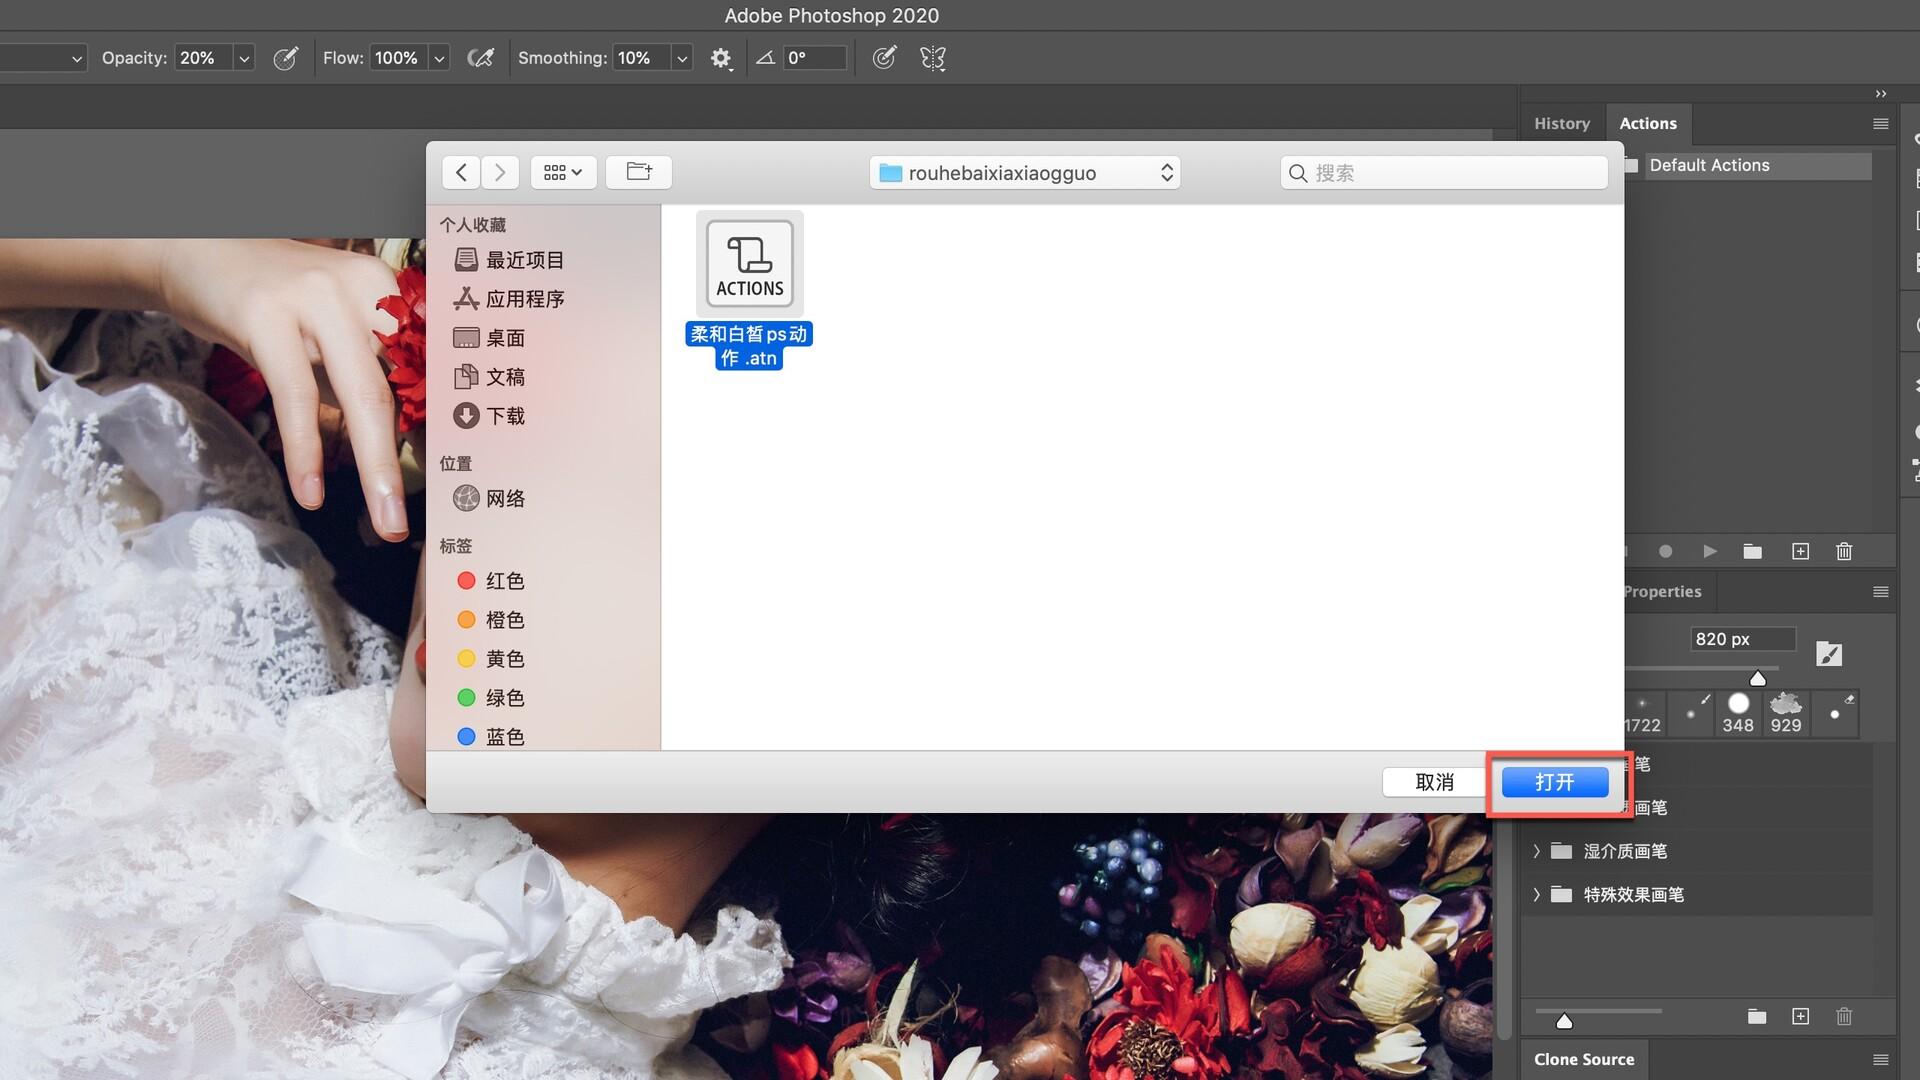 Photoshop如何导入动作?ps 2020动作导入方法详解,PS动作安装教程